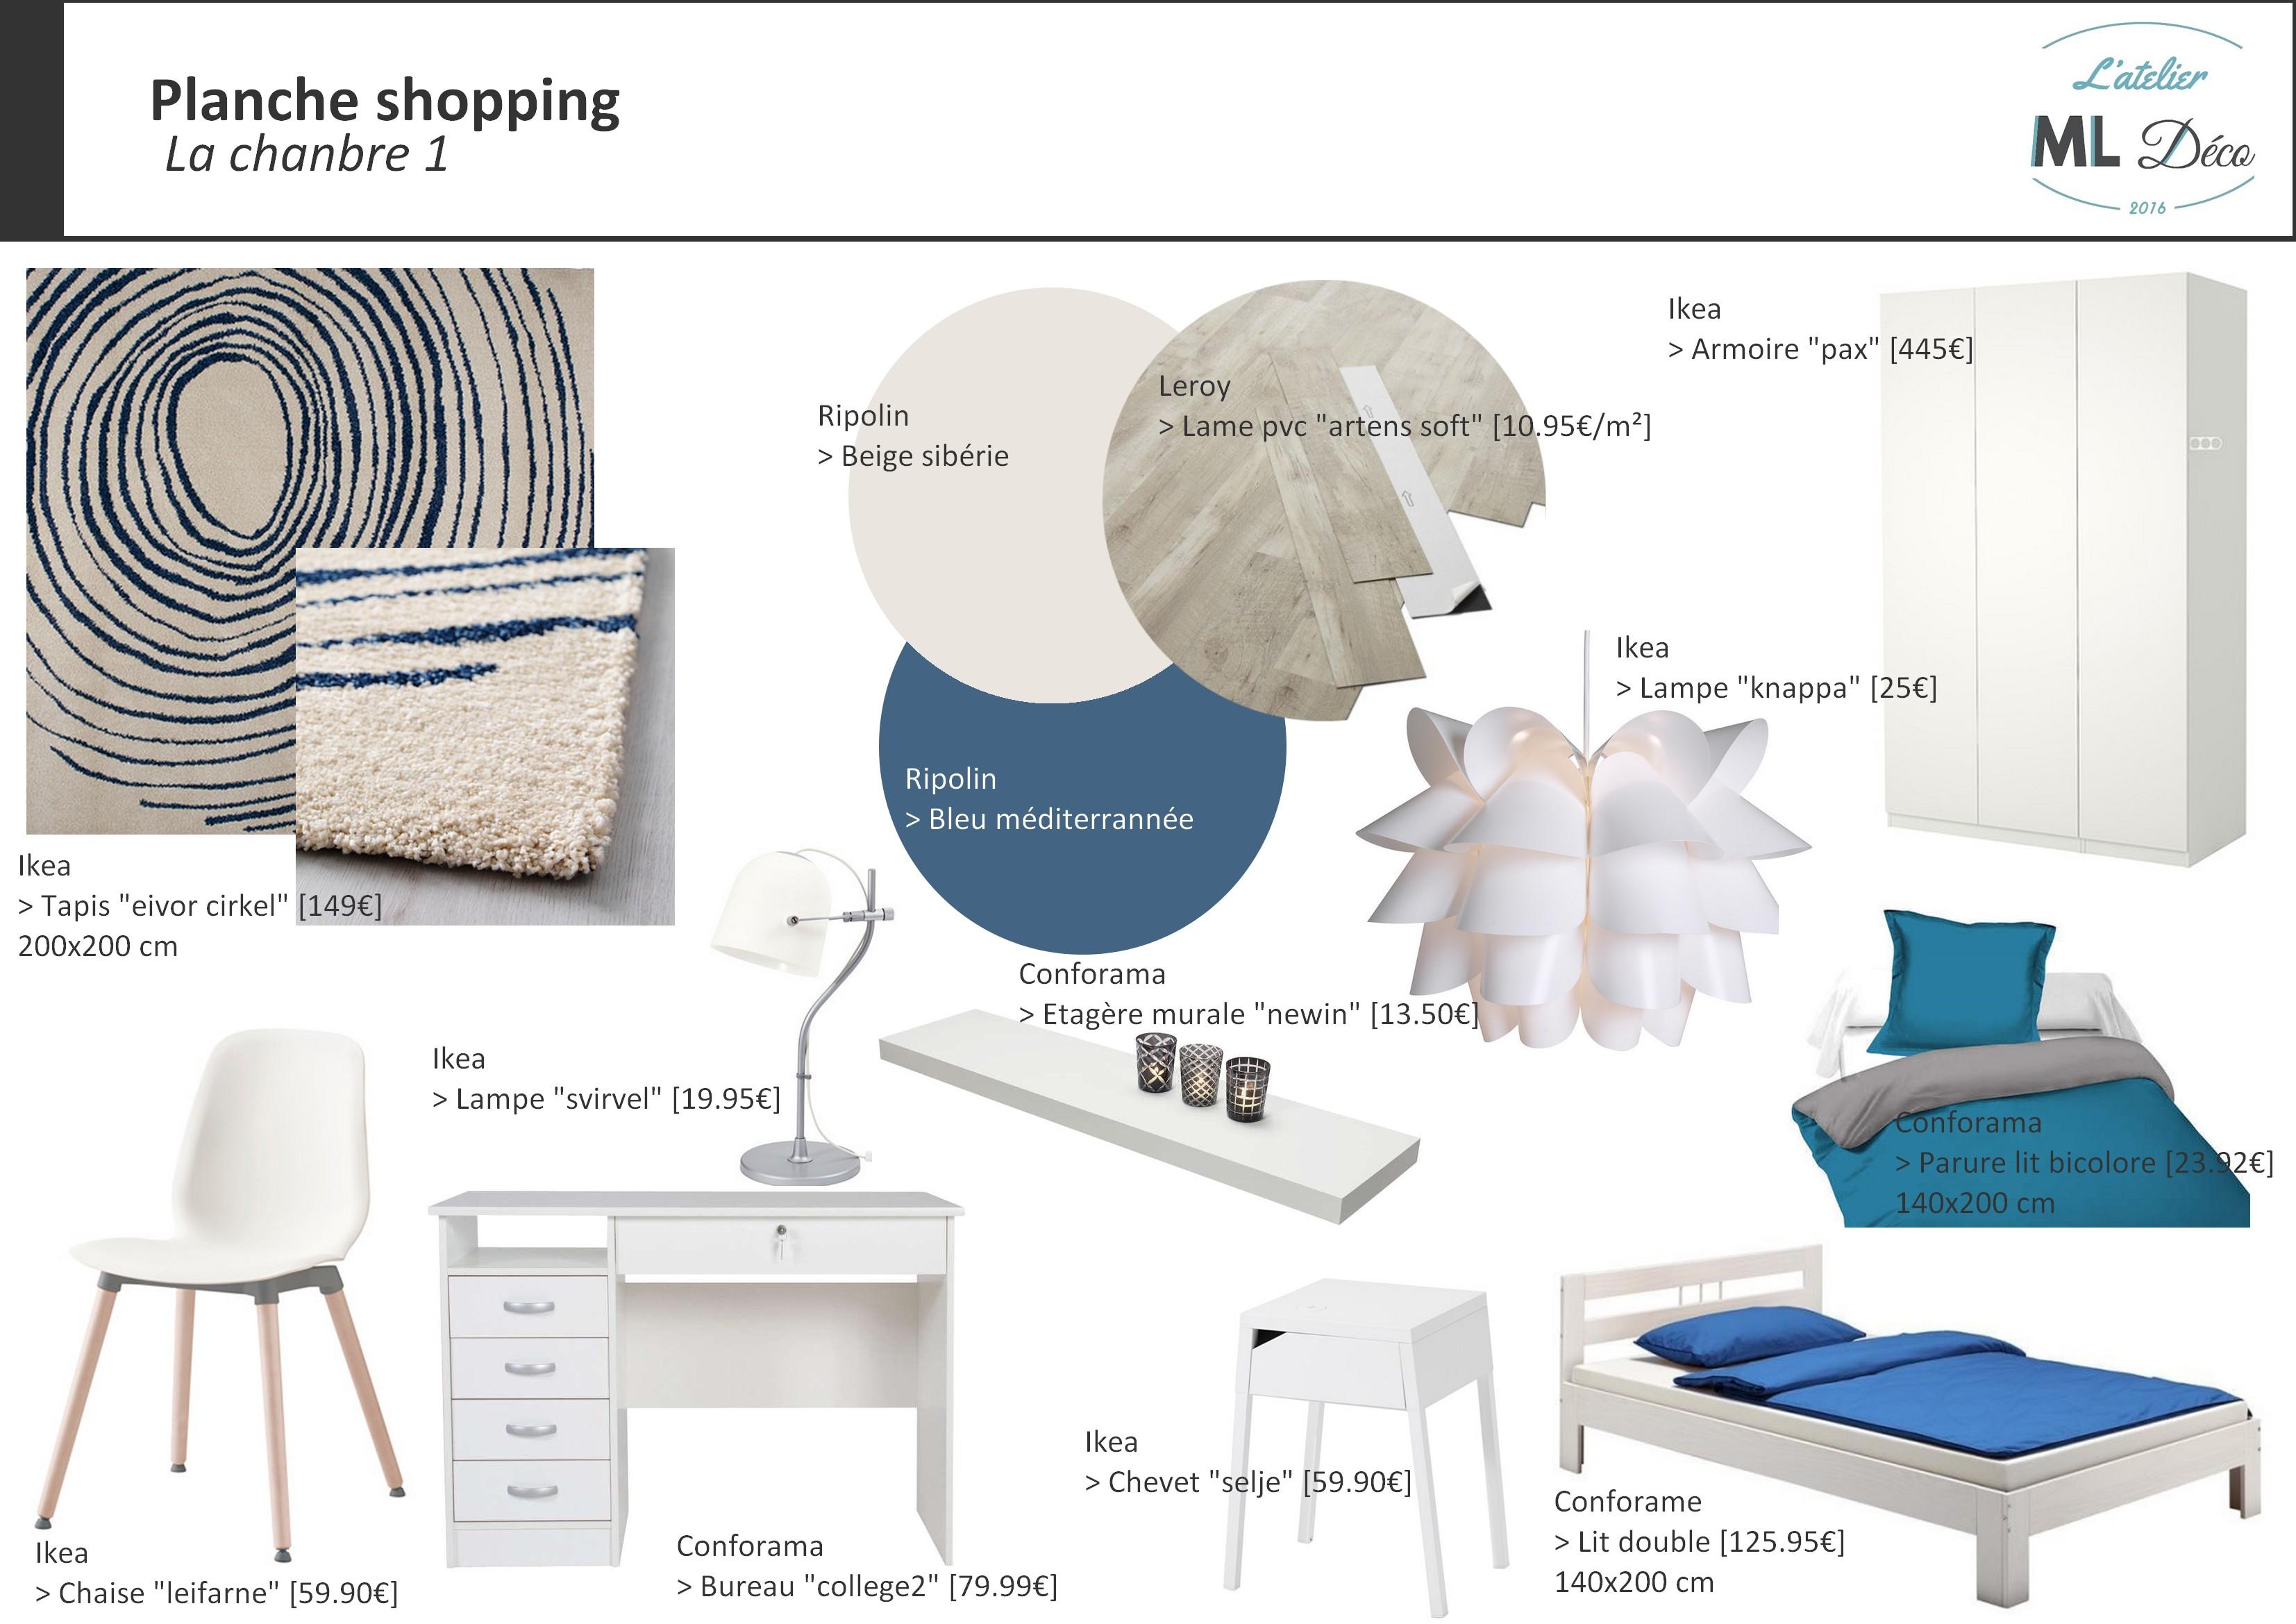 Planche shopping - Chambre 1